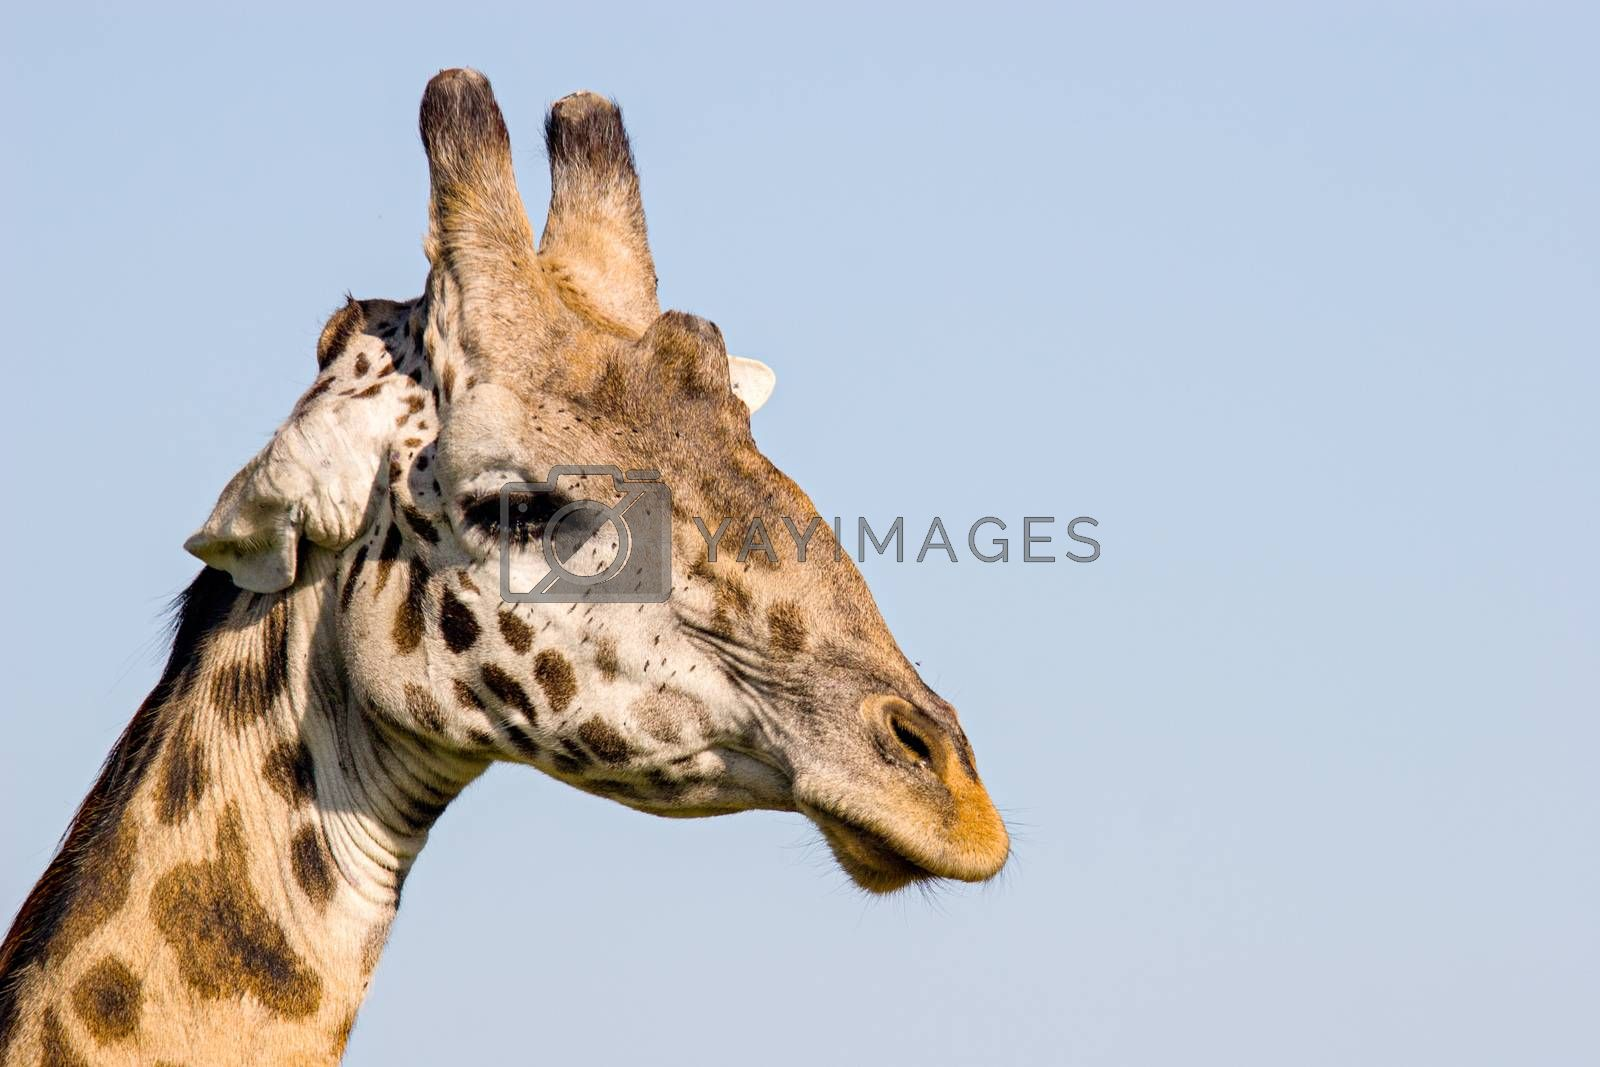 Giraffe Close Up by ajn